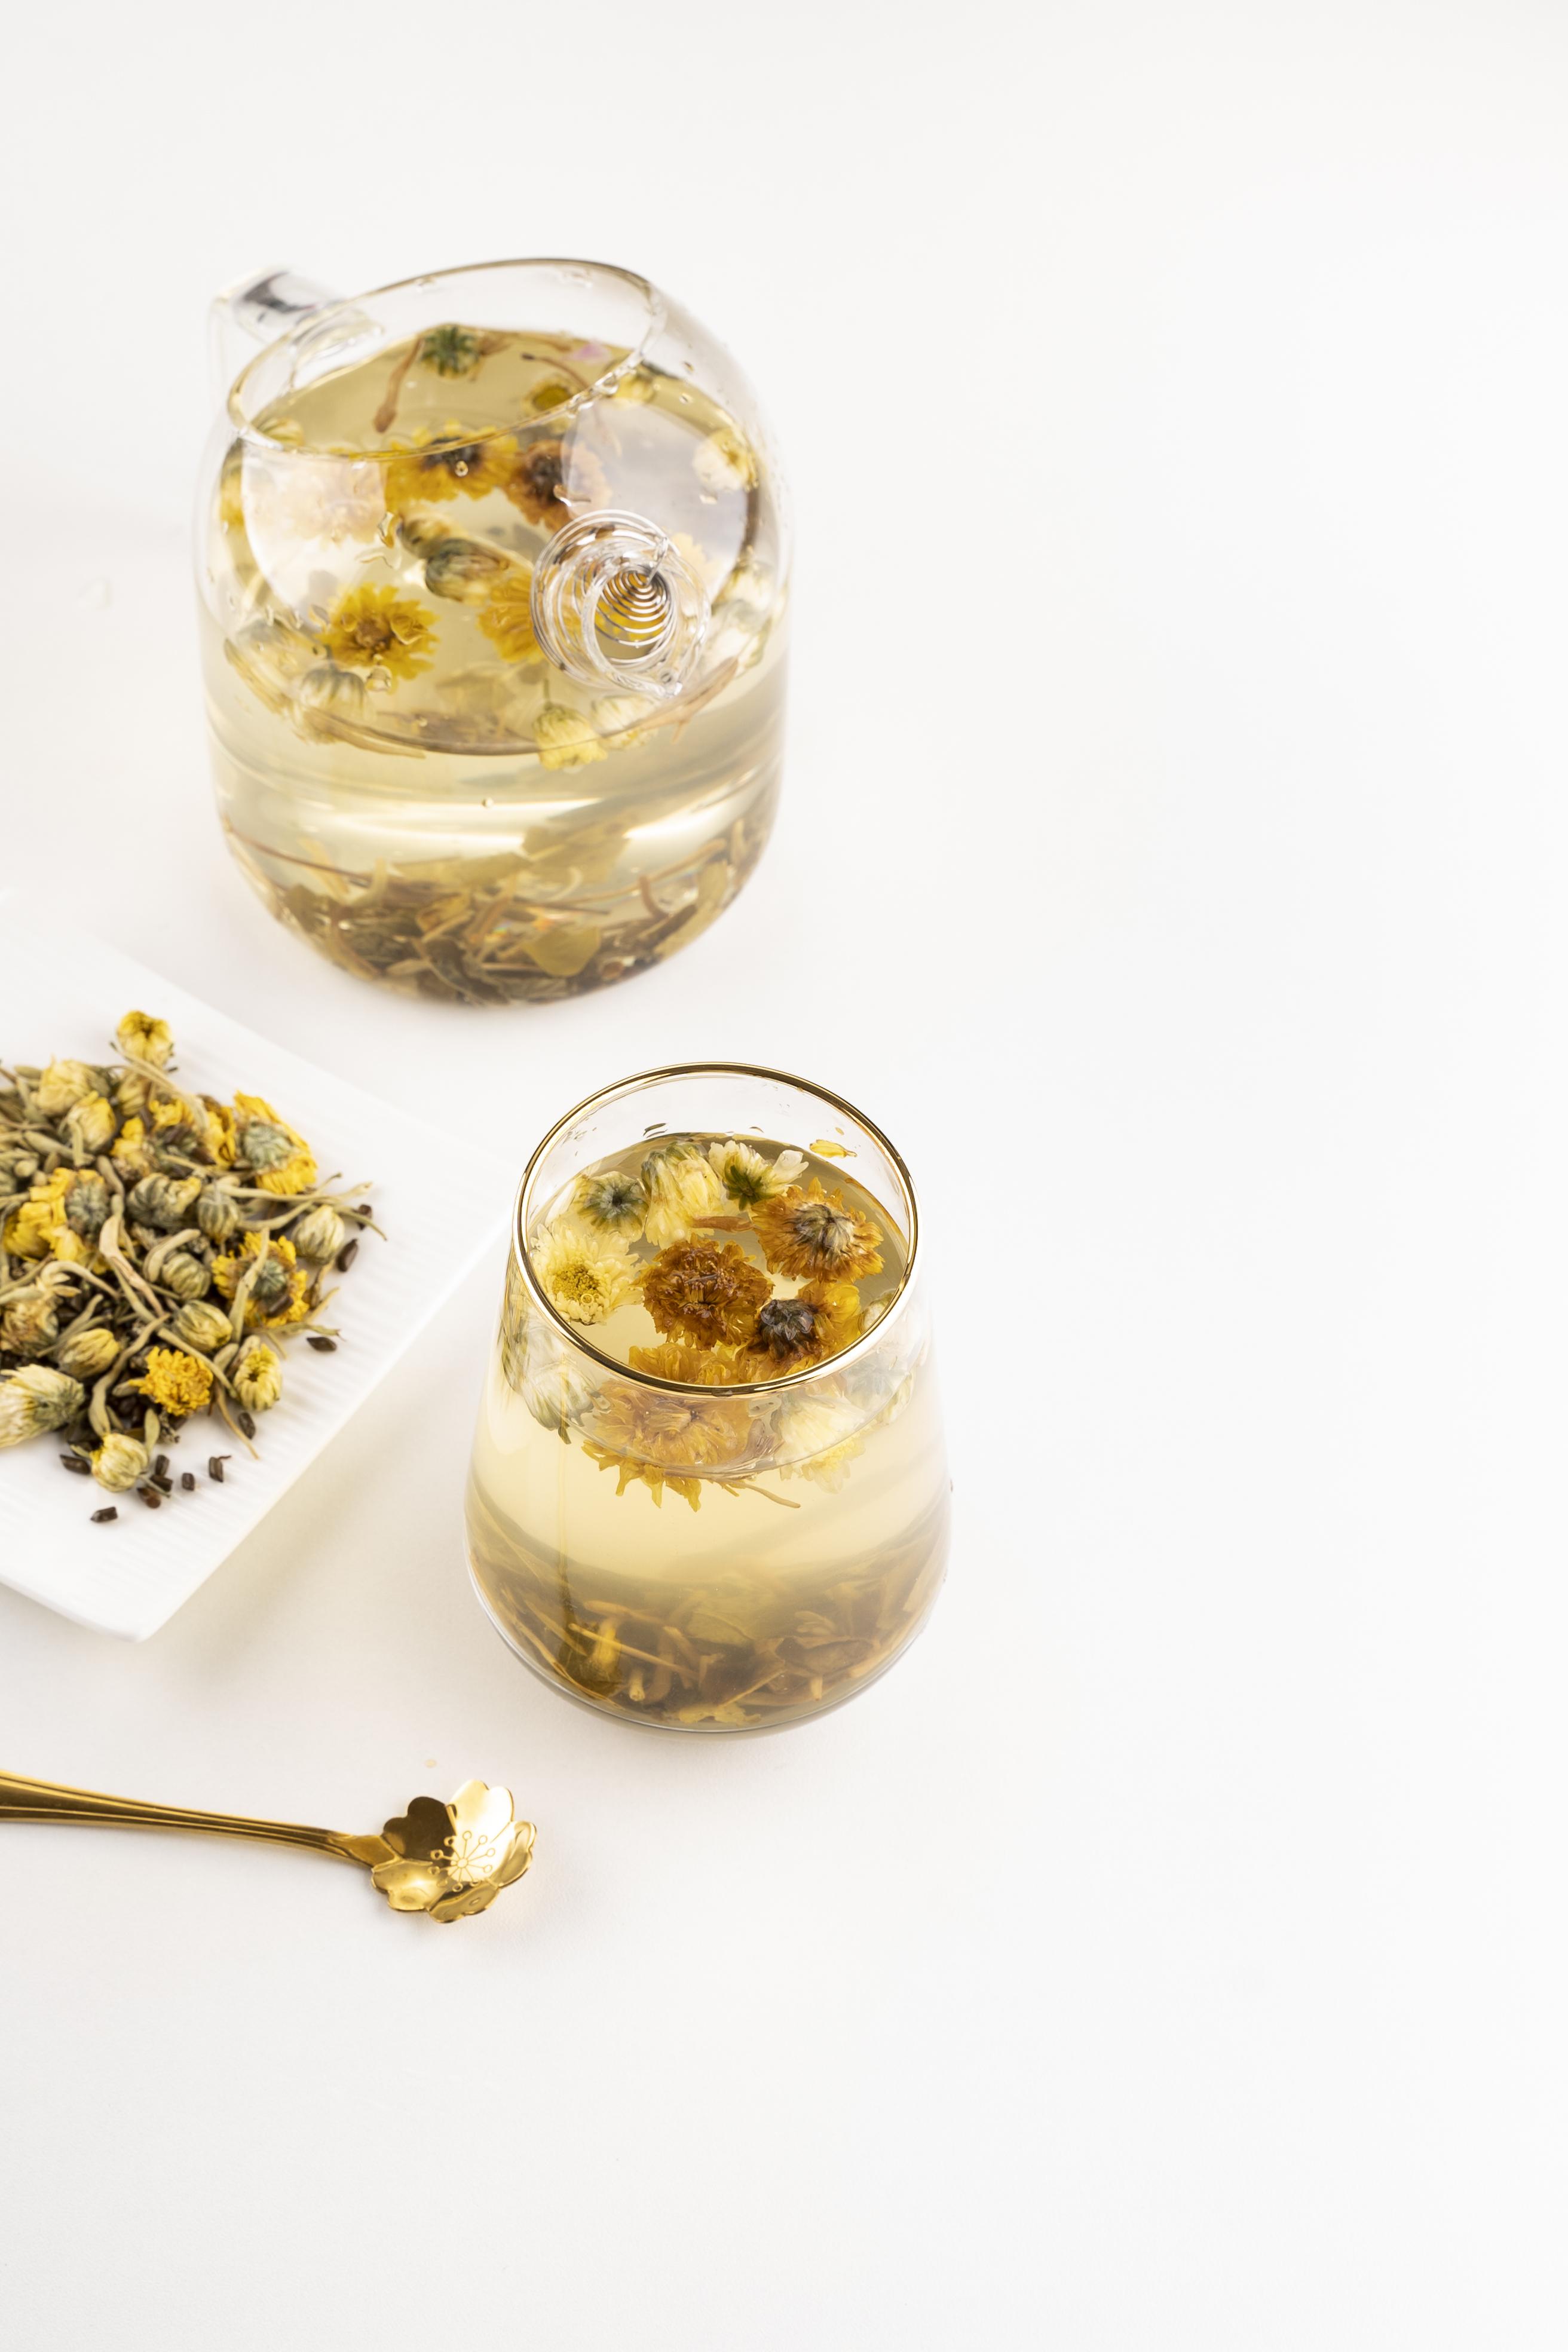 Christmas gift Wholesale Tummy green tea Sliming tea private label detox tea - 4uTea | 4uTea.com